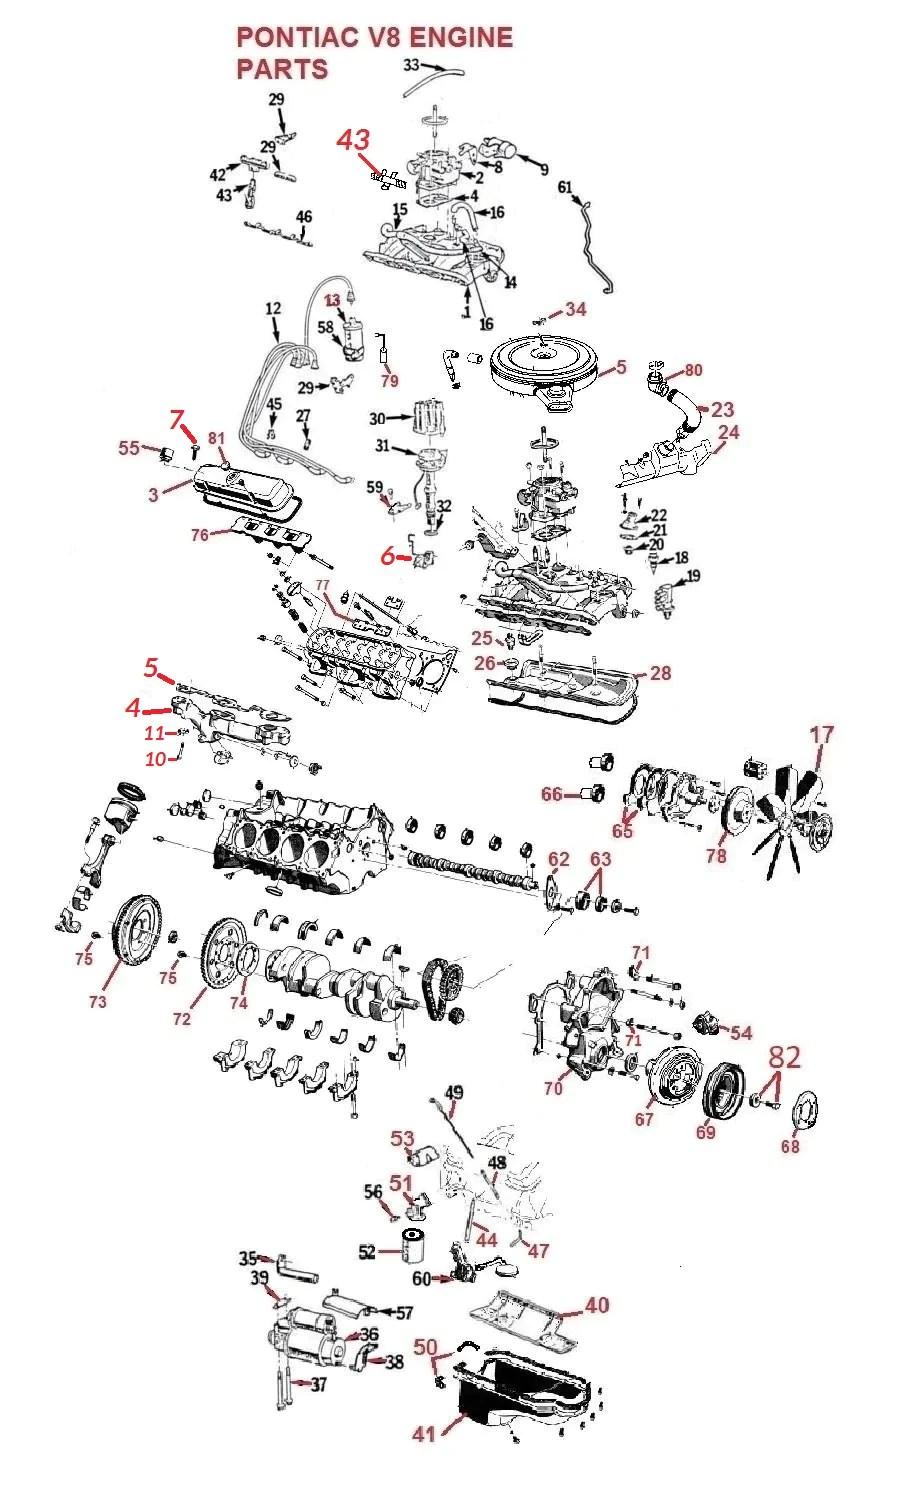 hight resolution of 67 72 pontiac v8 engine parts